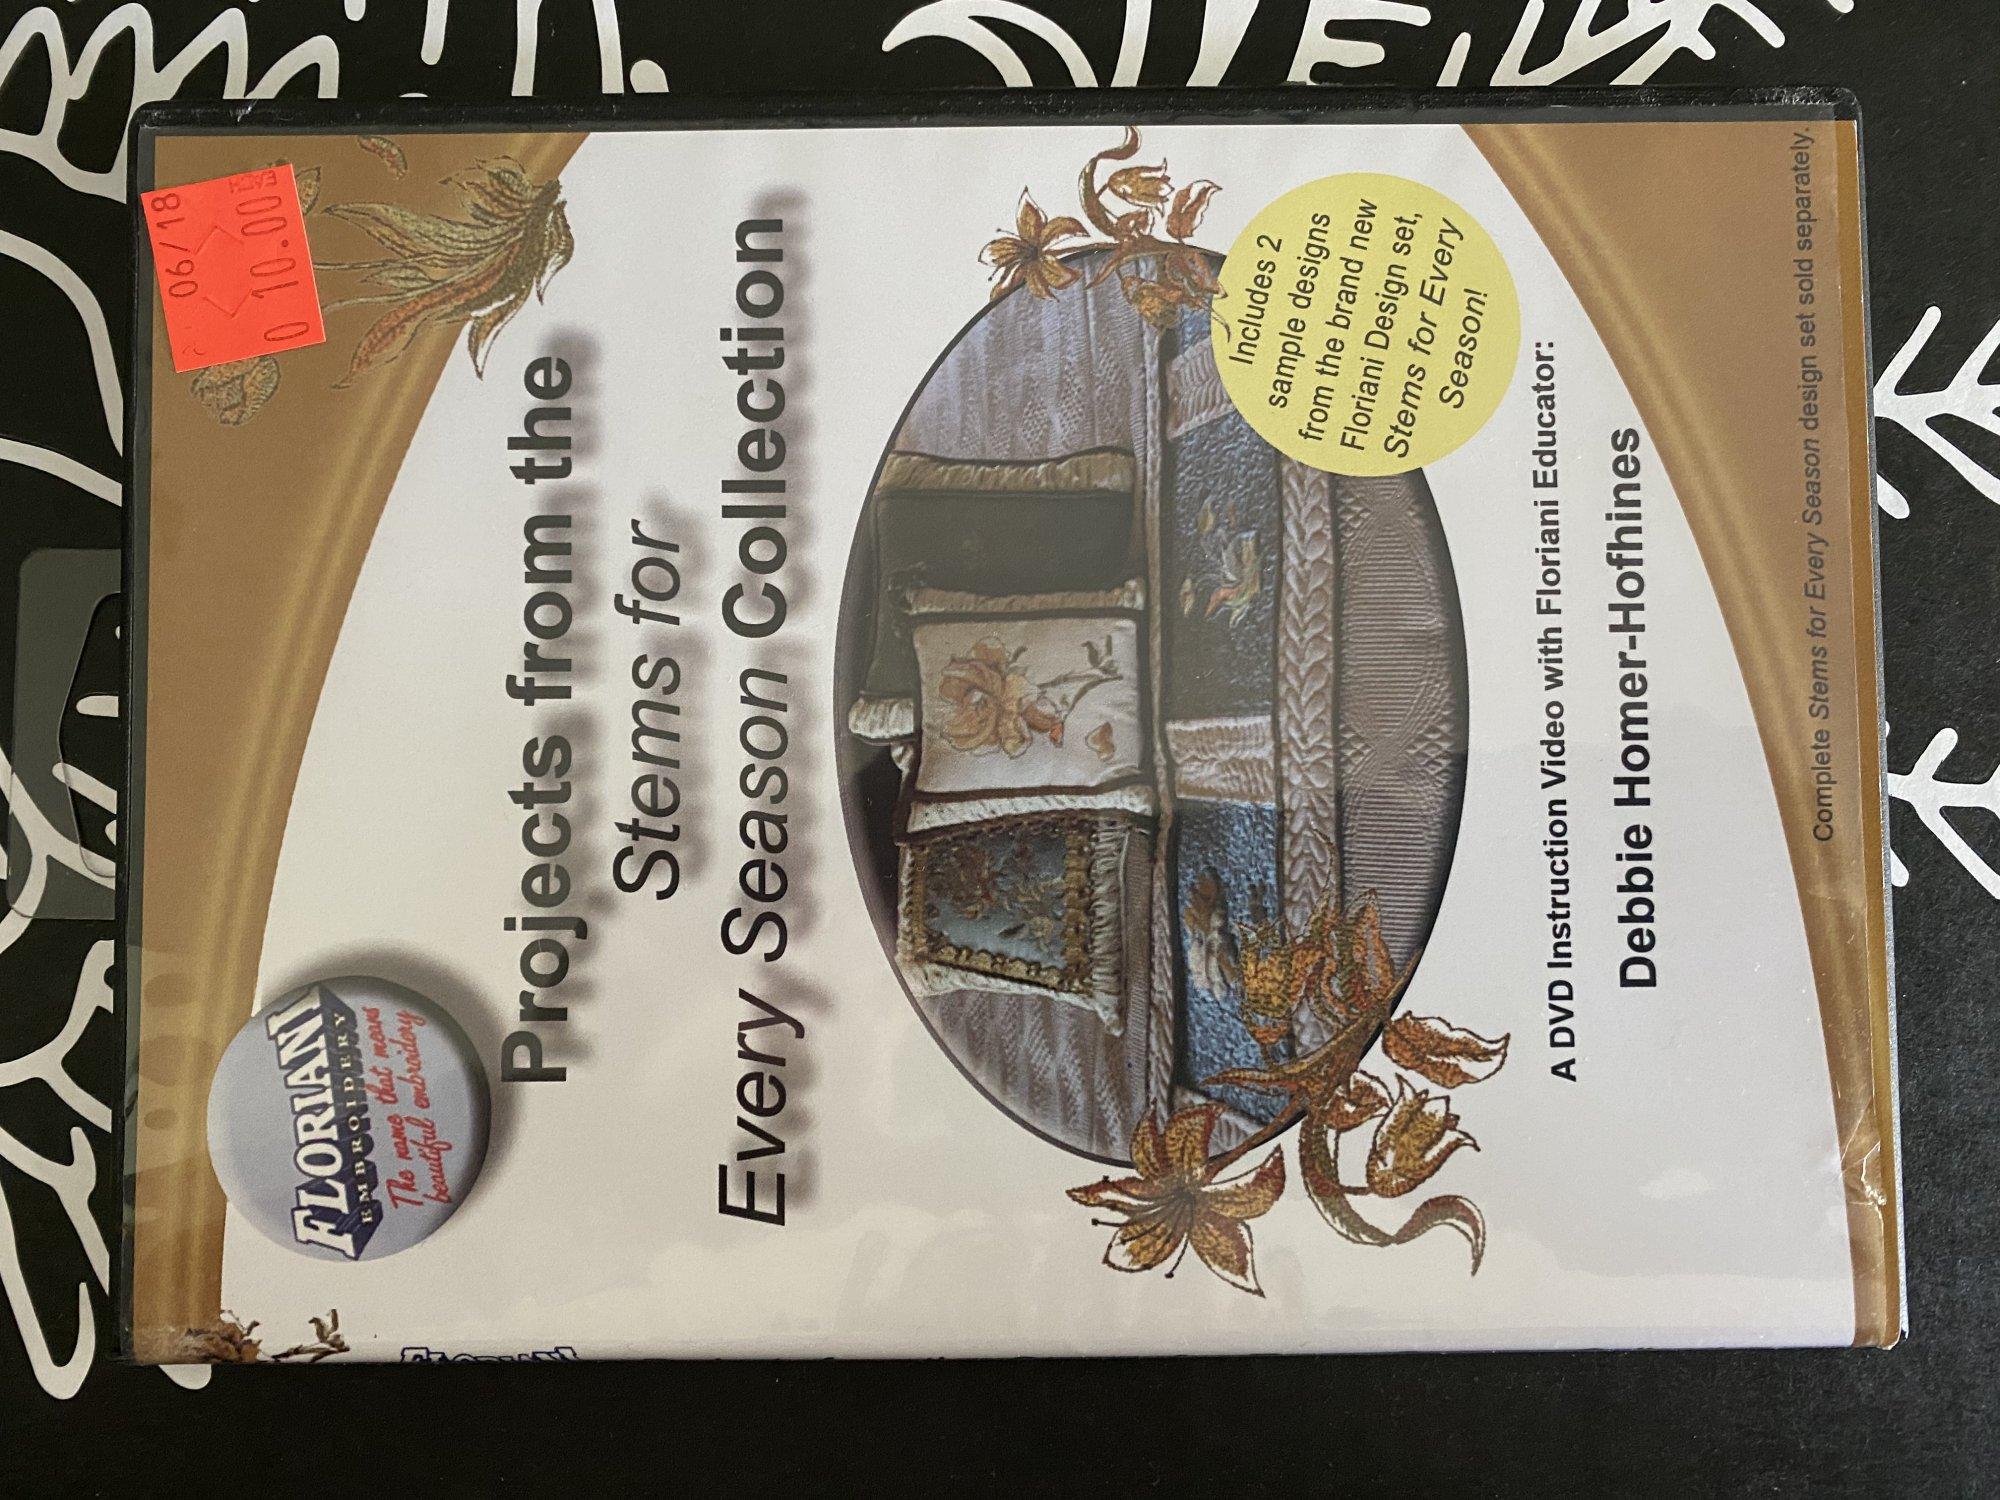 FLORIANI DVD - STEMS FOR EVERY SEASON